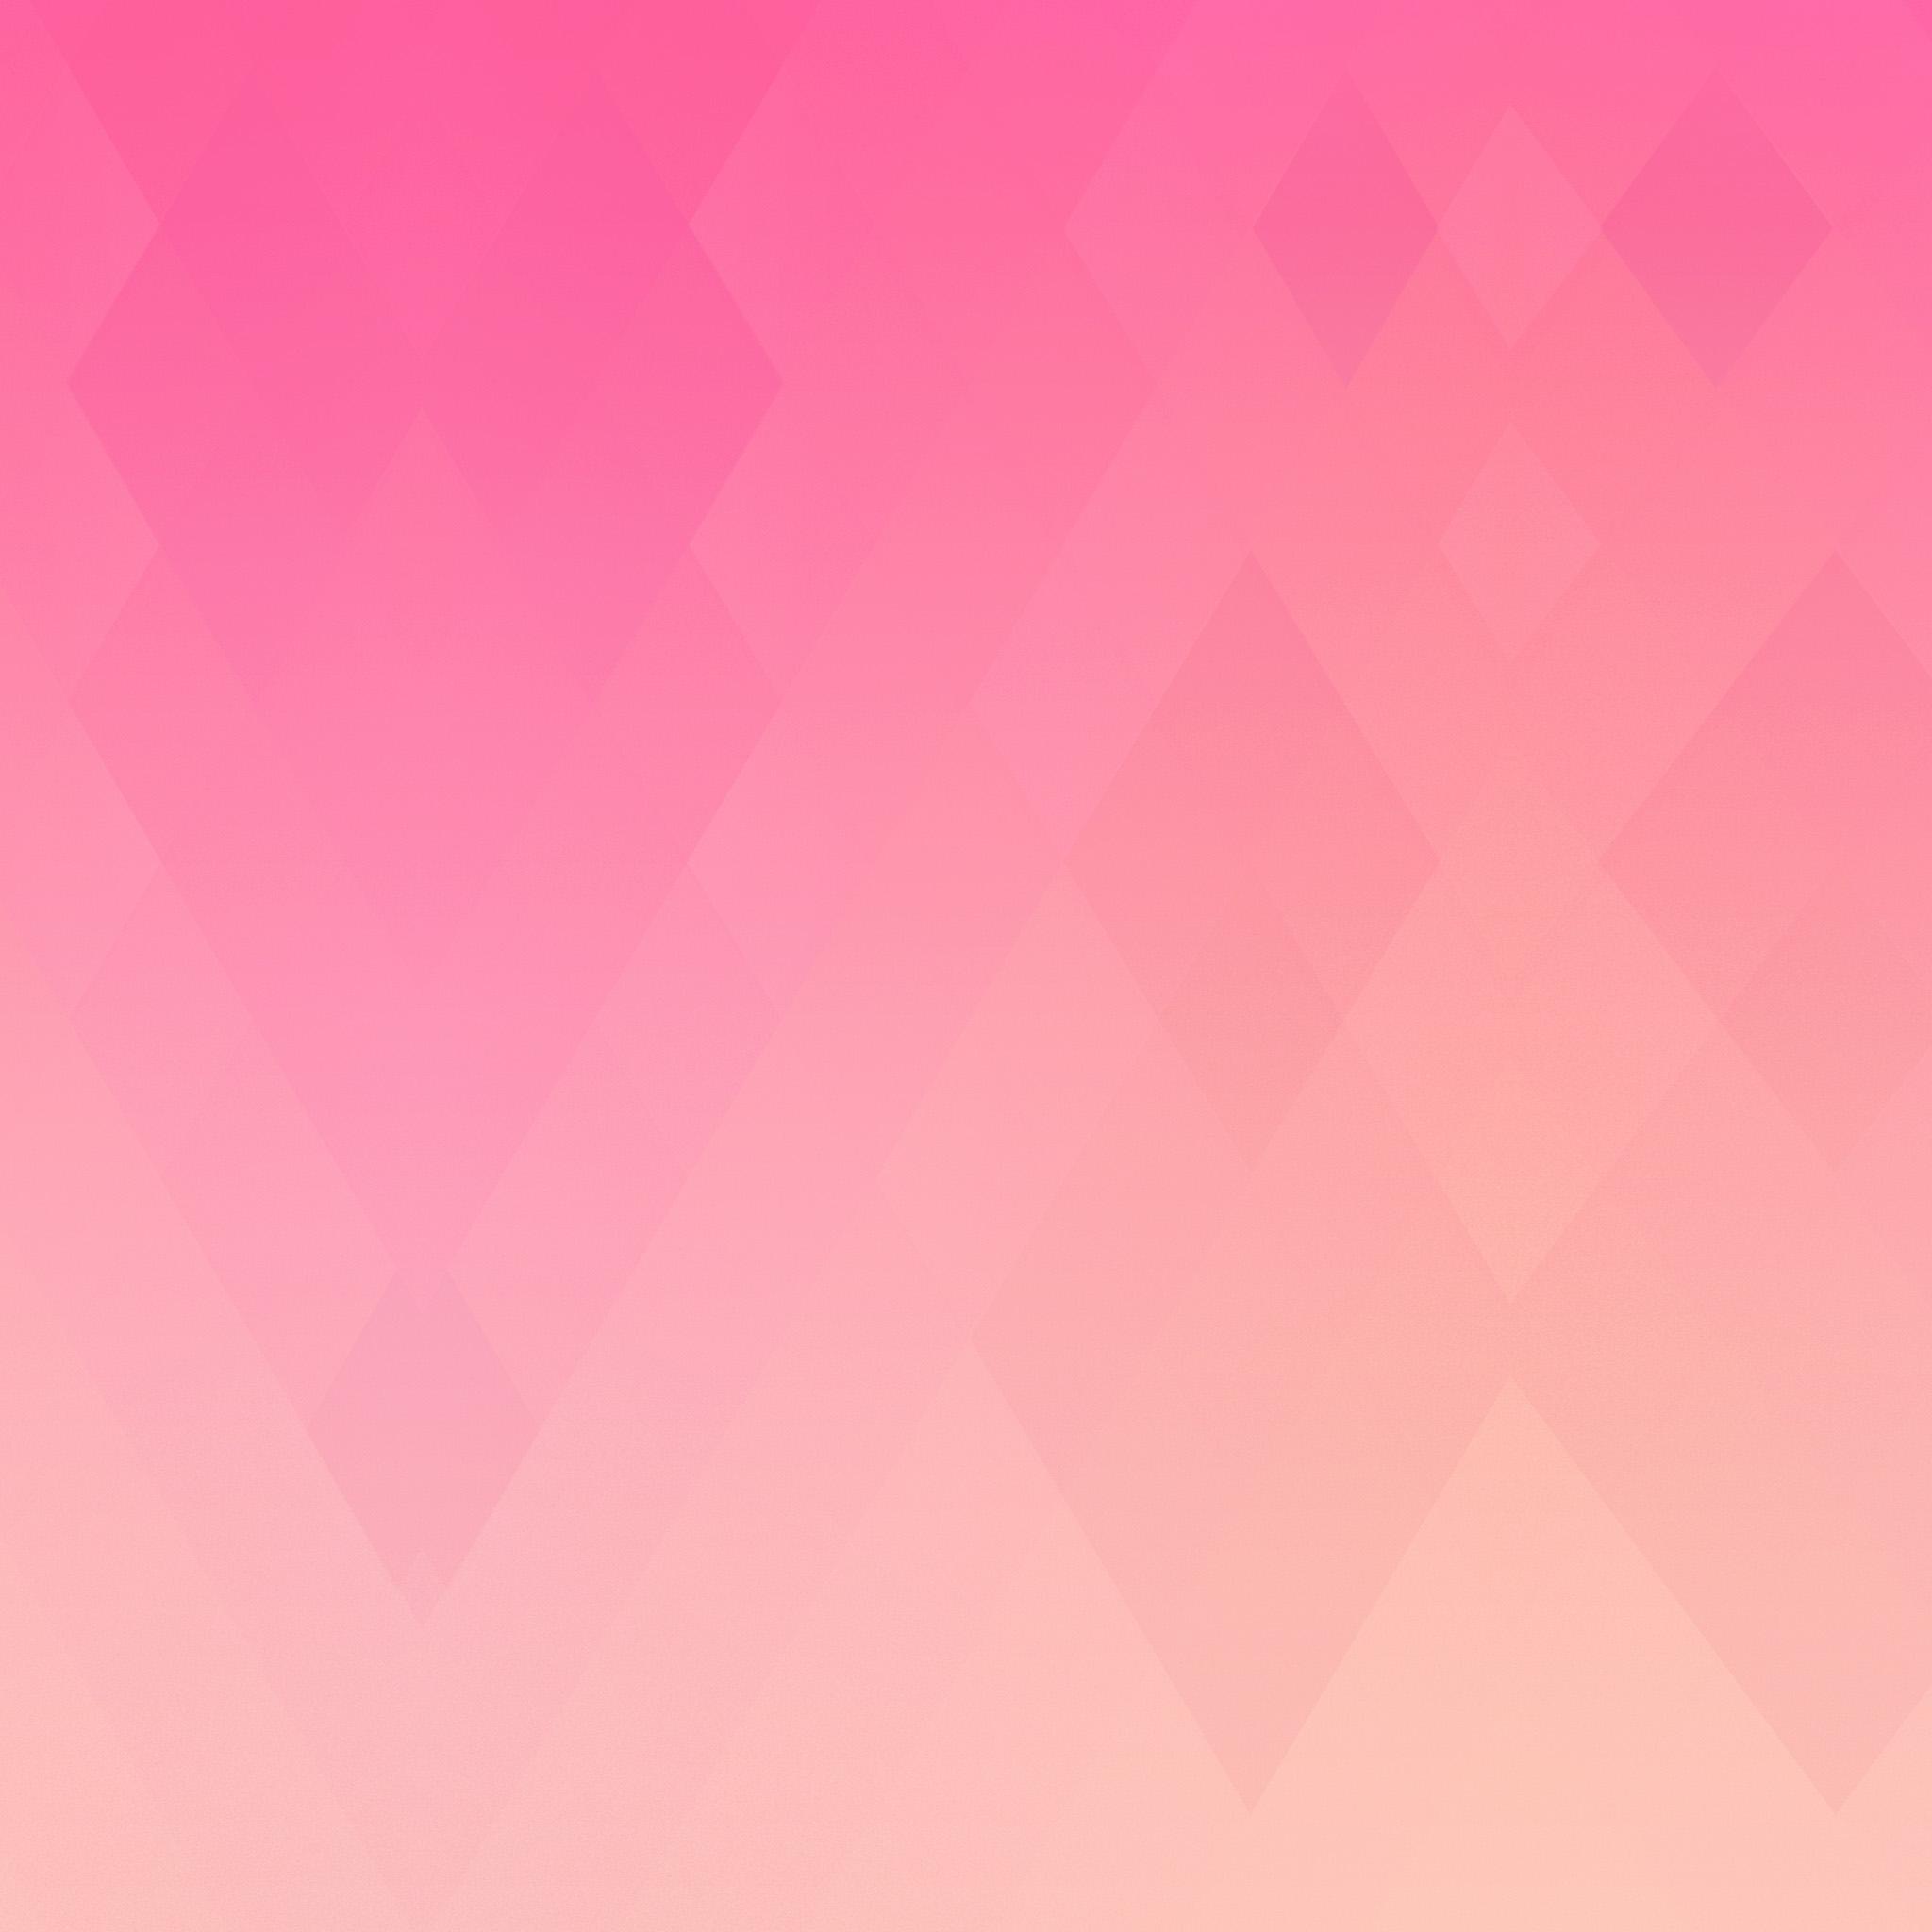 Iphone 6 Plus Fall Wallpaper Wallpapers